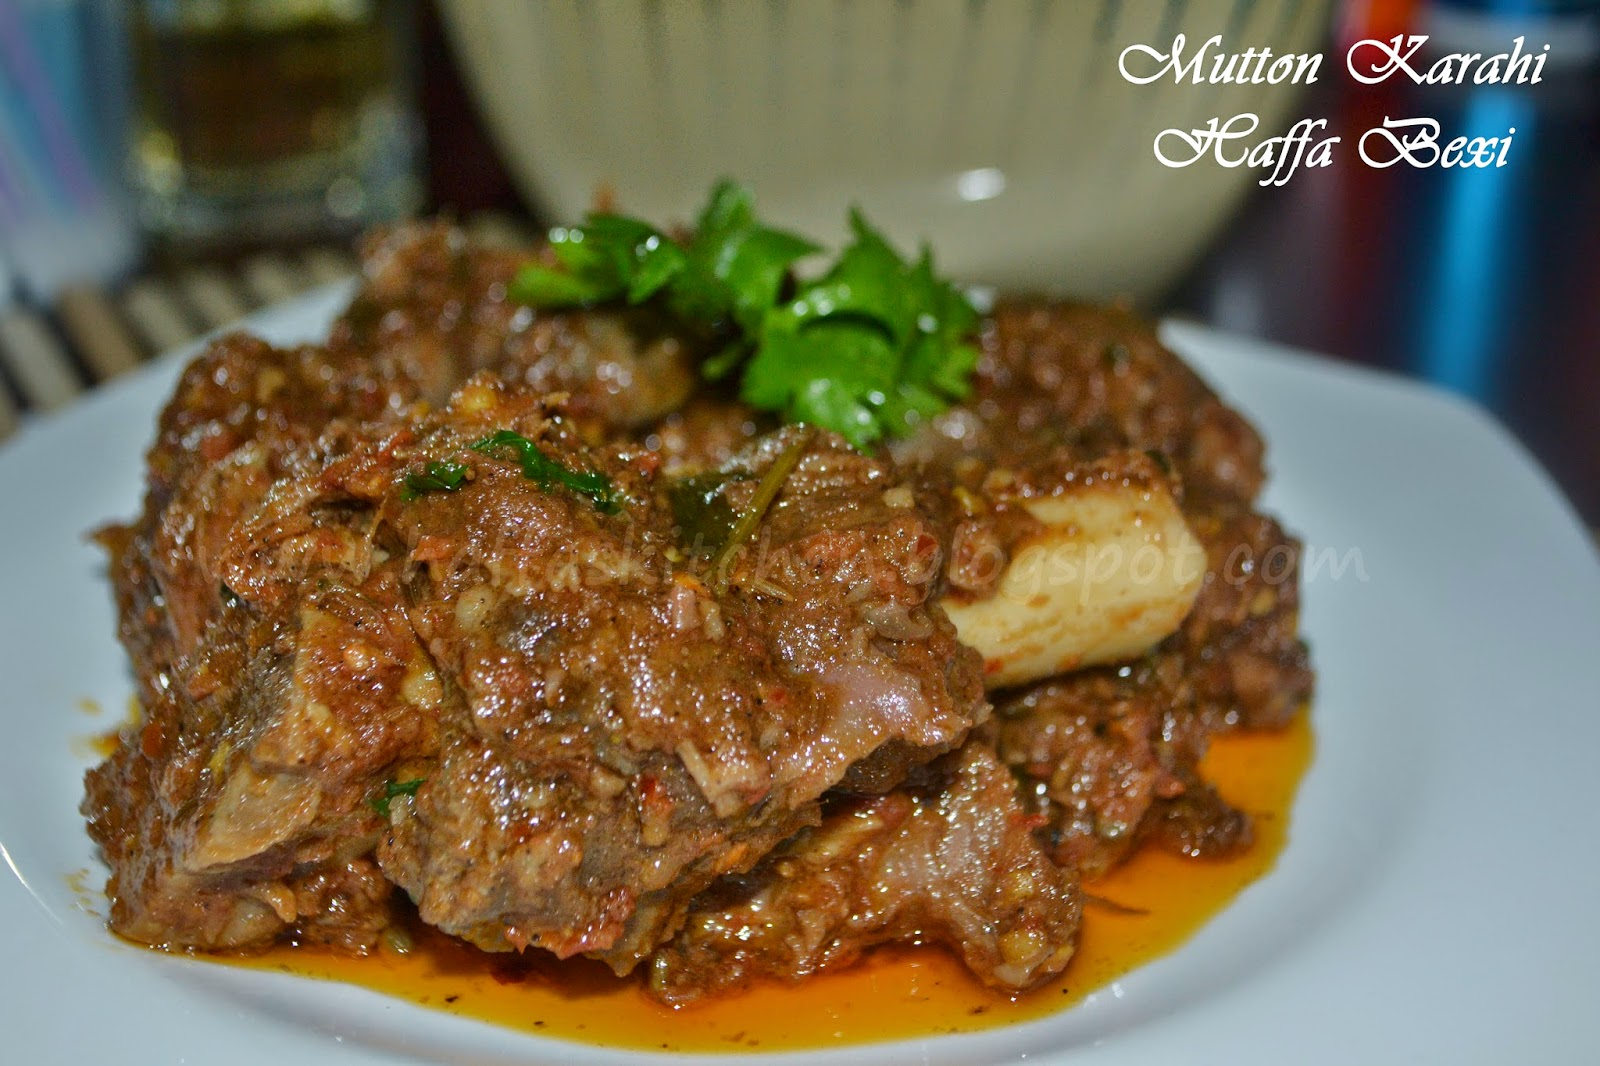 Mutton karahi karahi gosht haffas kitchen adventures meat recipes eid ul azha recipes mutton recipes pakistanihow to cook mutton forumfinder Gallery